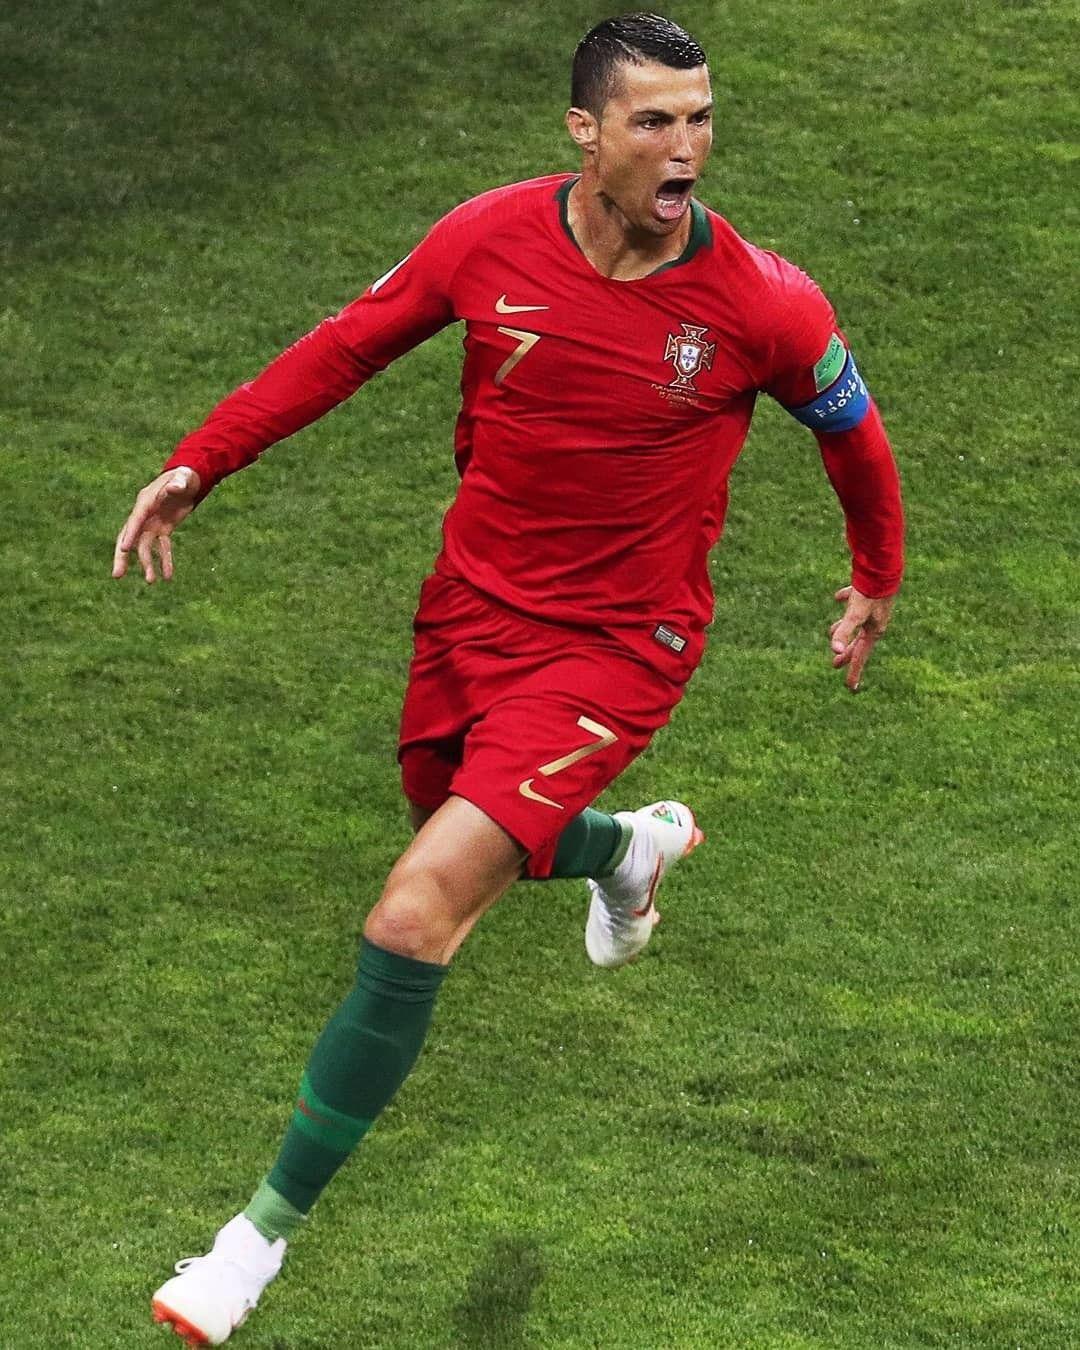 Cristiano Ronaldo Roar Soccer Pinterest Ronaldo Cristiano